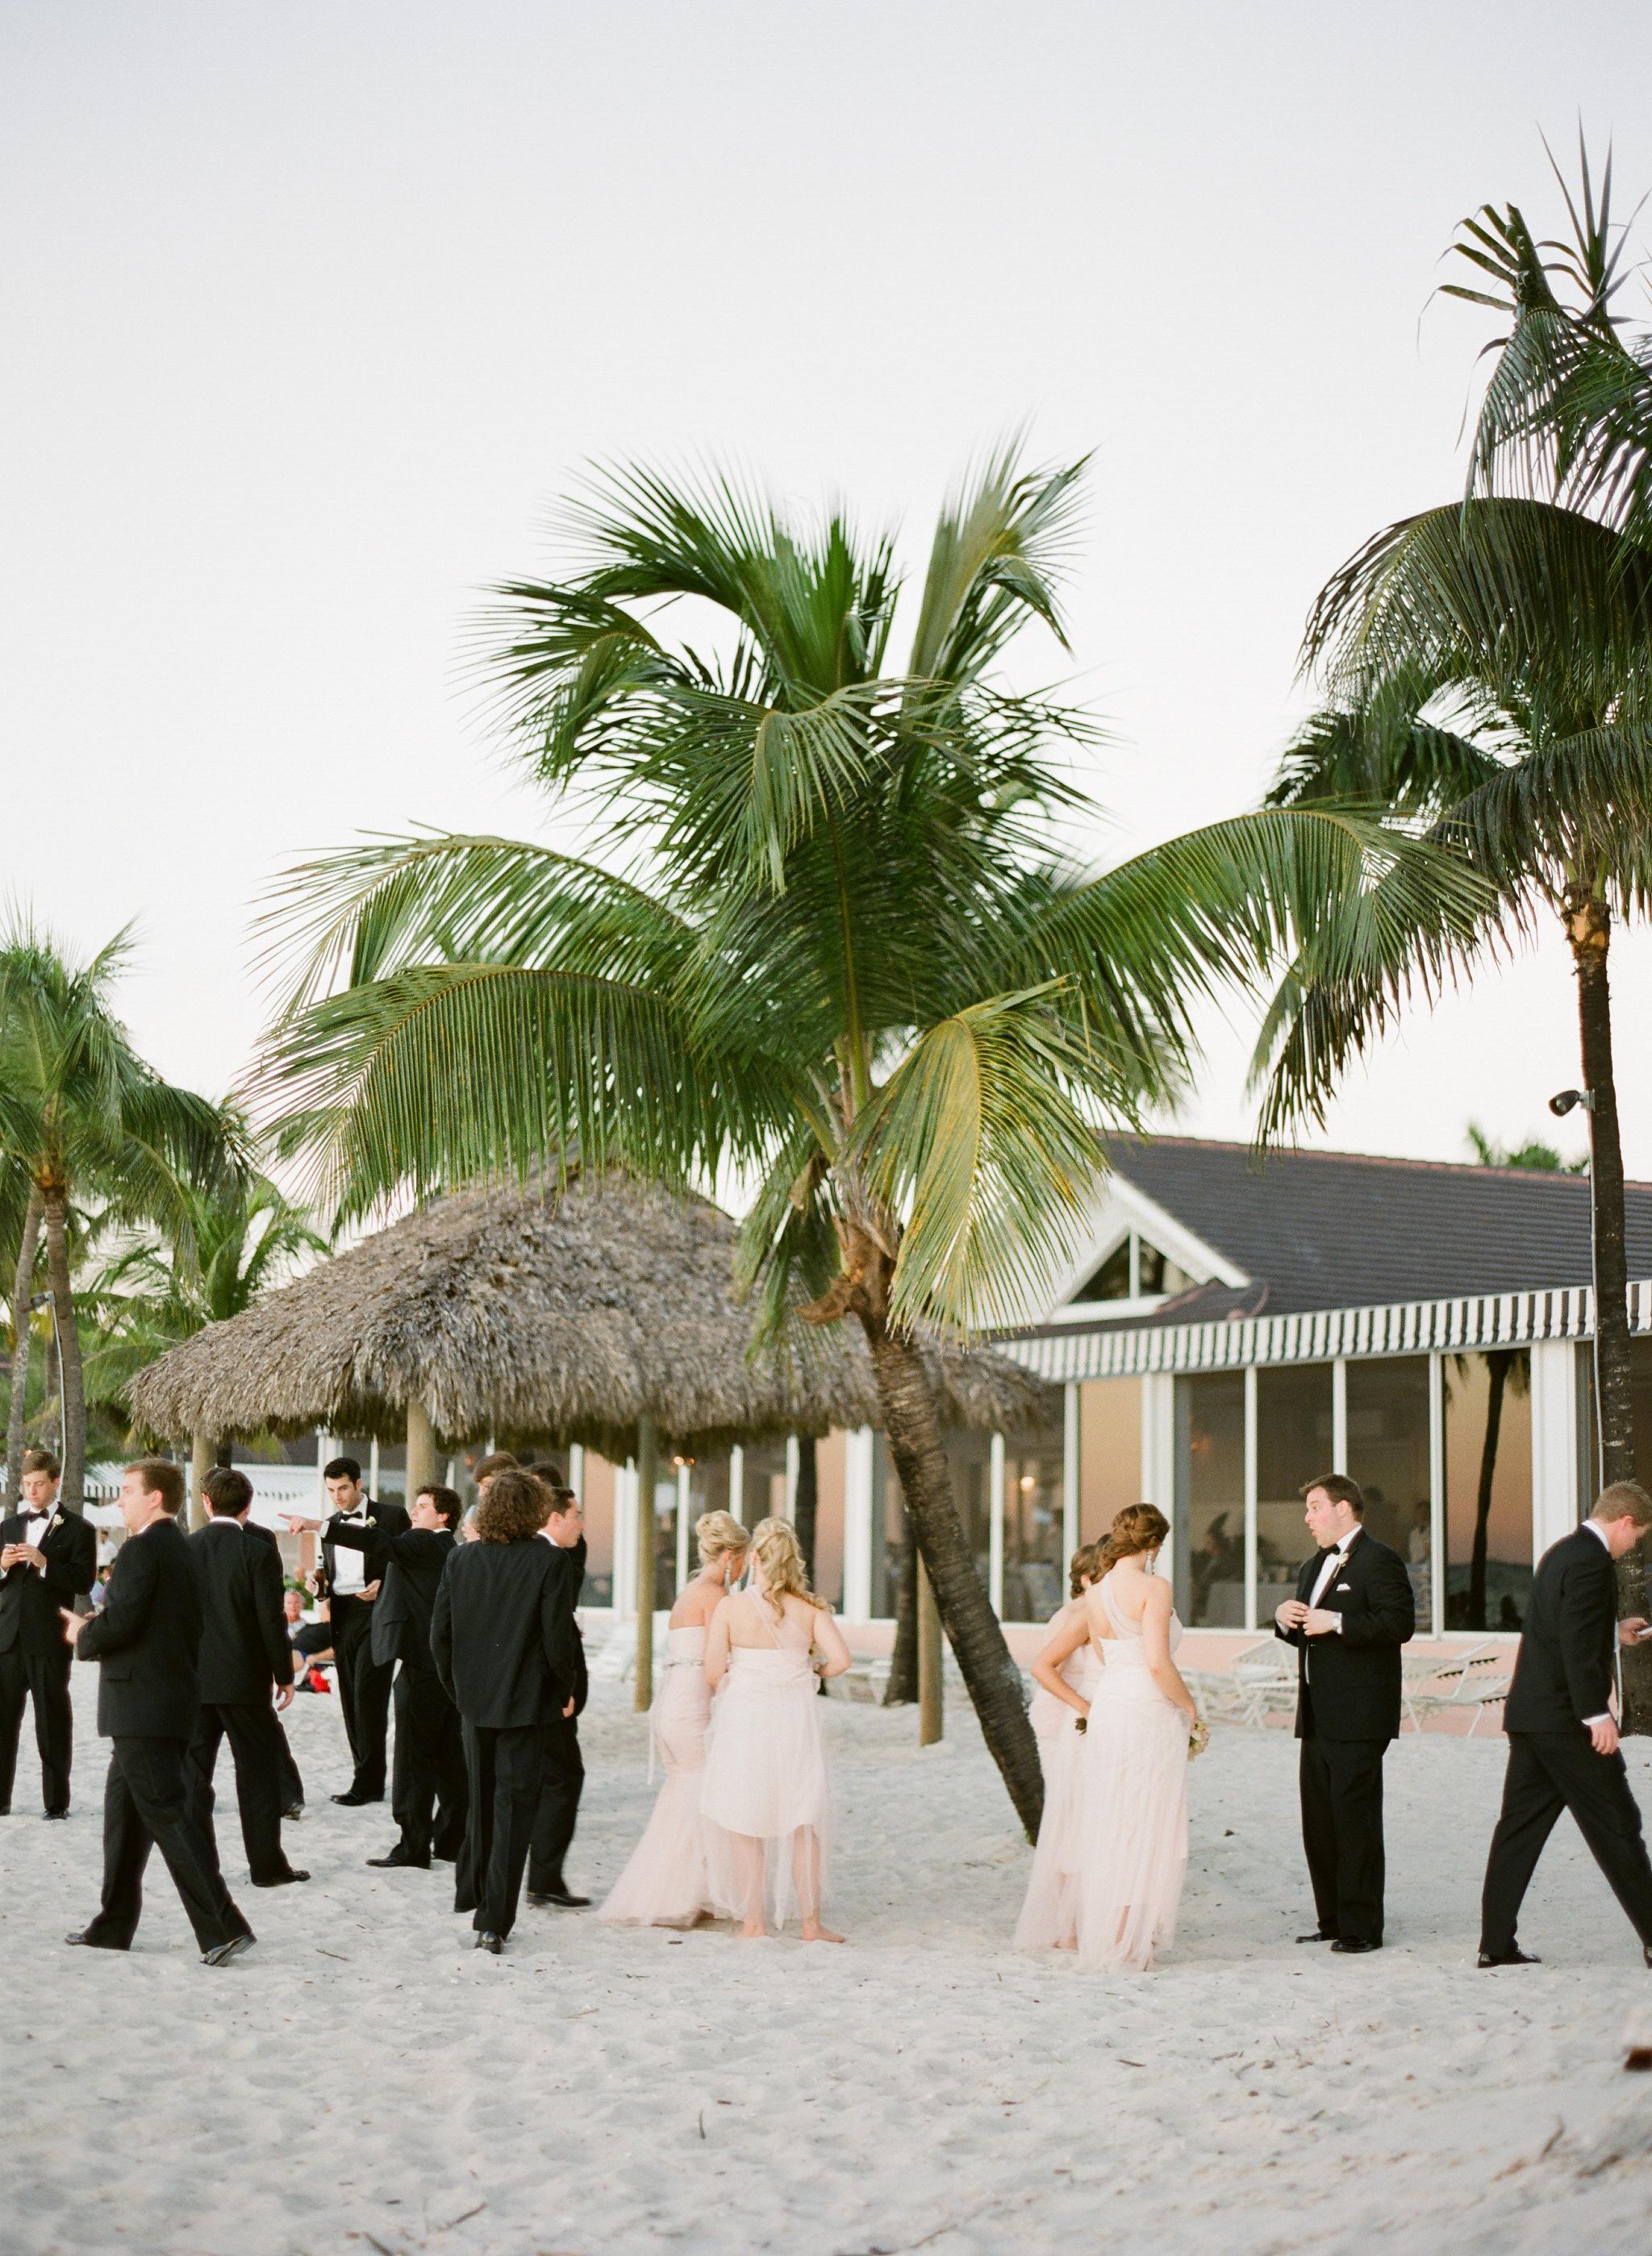 Ceci_New_York_Florida_Wedding_Style_Bride_Watercolor_Real_Custom_Luxury_88.jpg